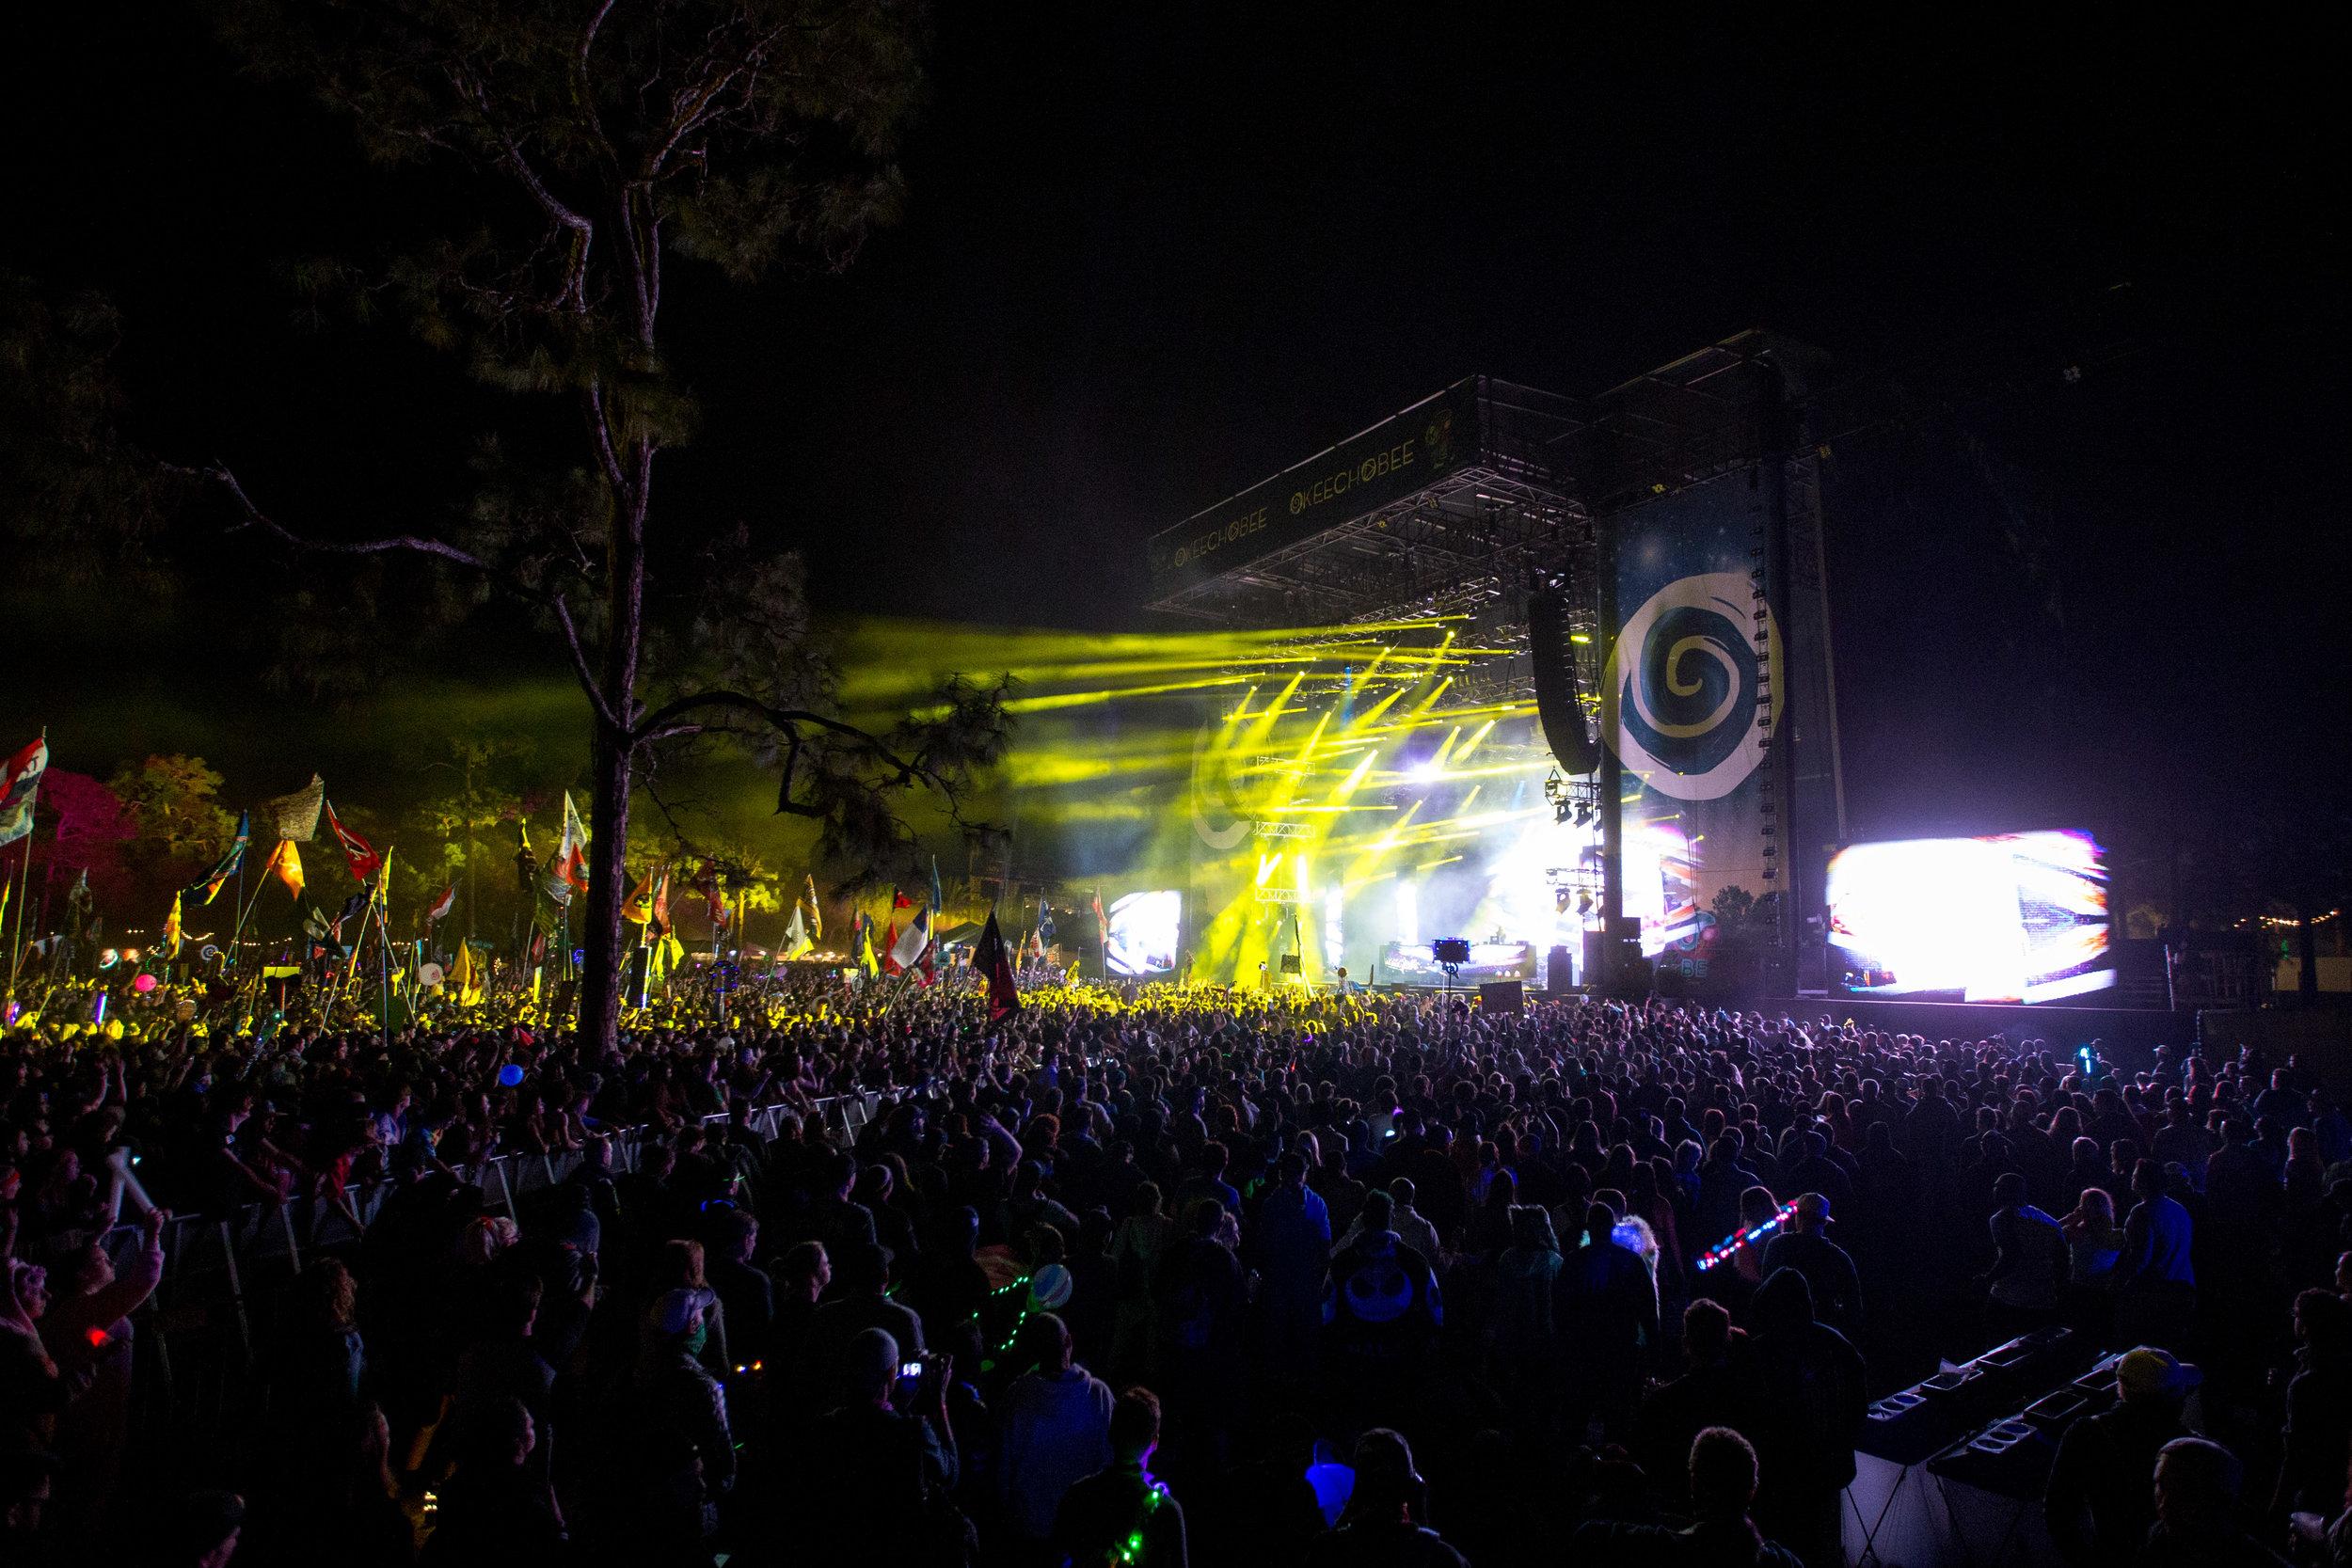 Bassnectar at Okeechobee Festival 2017 - March 4, 2017 - Okeechobee, Florida